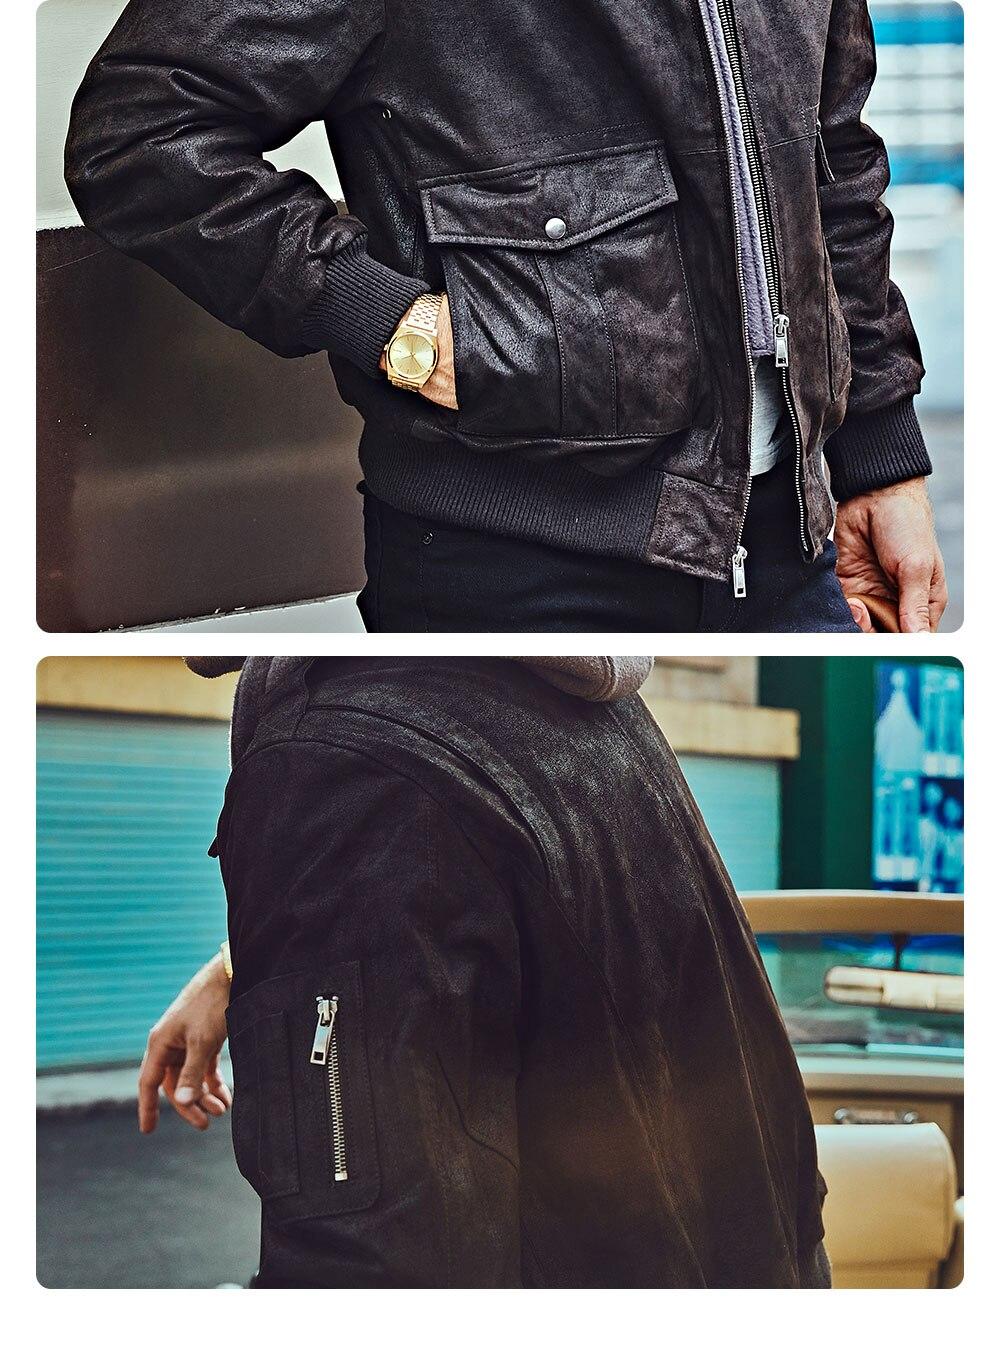 H562716f6700d4bbebc6fdac60270827b5 FLAVOR New Men's Genuine Leather Bomber Jackets Removable Hood Men Air Forca Aviator winter coat Men Warm Real Leather Jacket